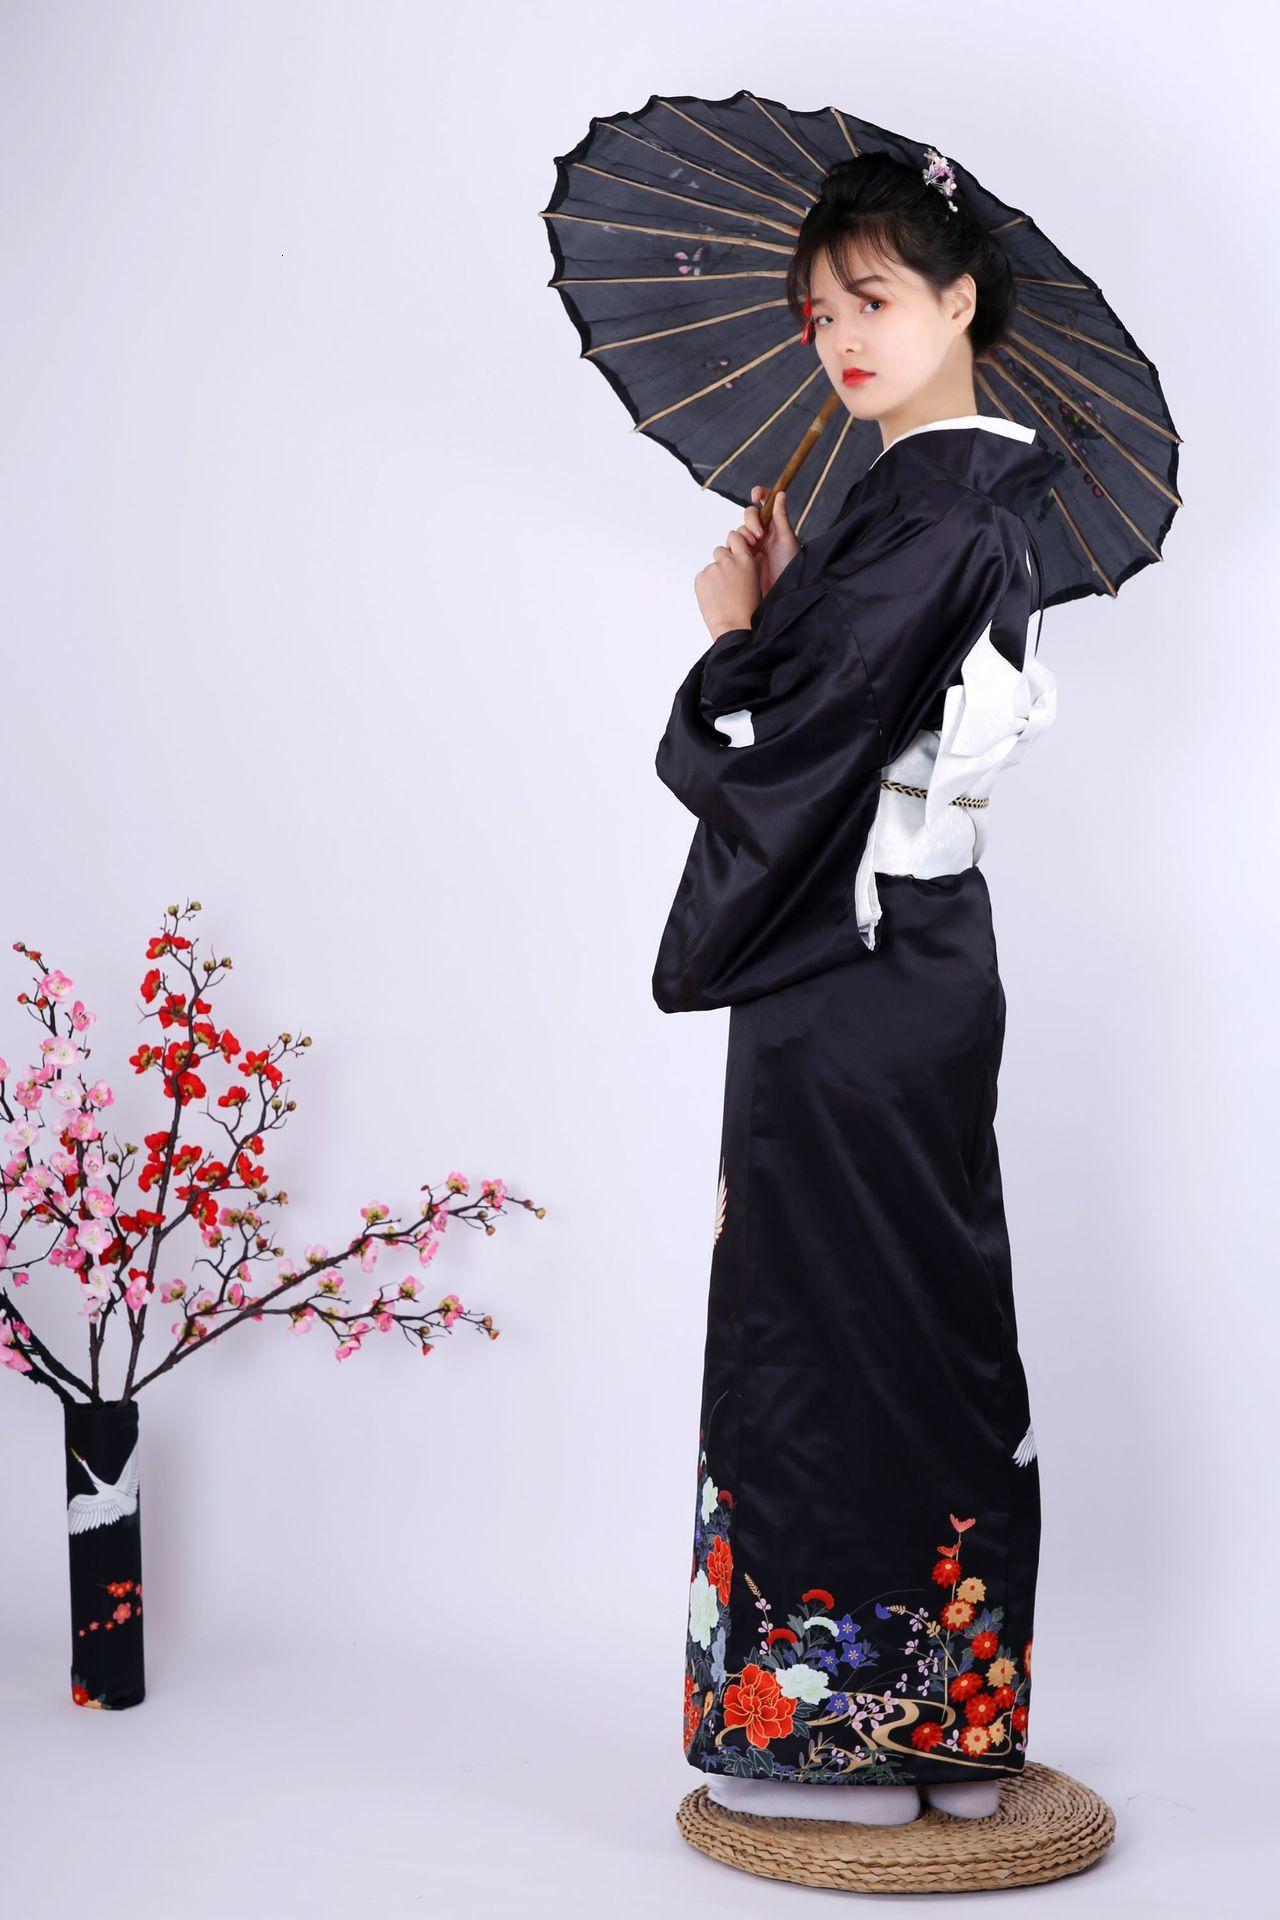 Japan Kimono Traditional Woman Kimono Dress Black Sleeve Kimono Tradition Red-crowned Crane Handle Kimono Japanese Roupa Geisha